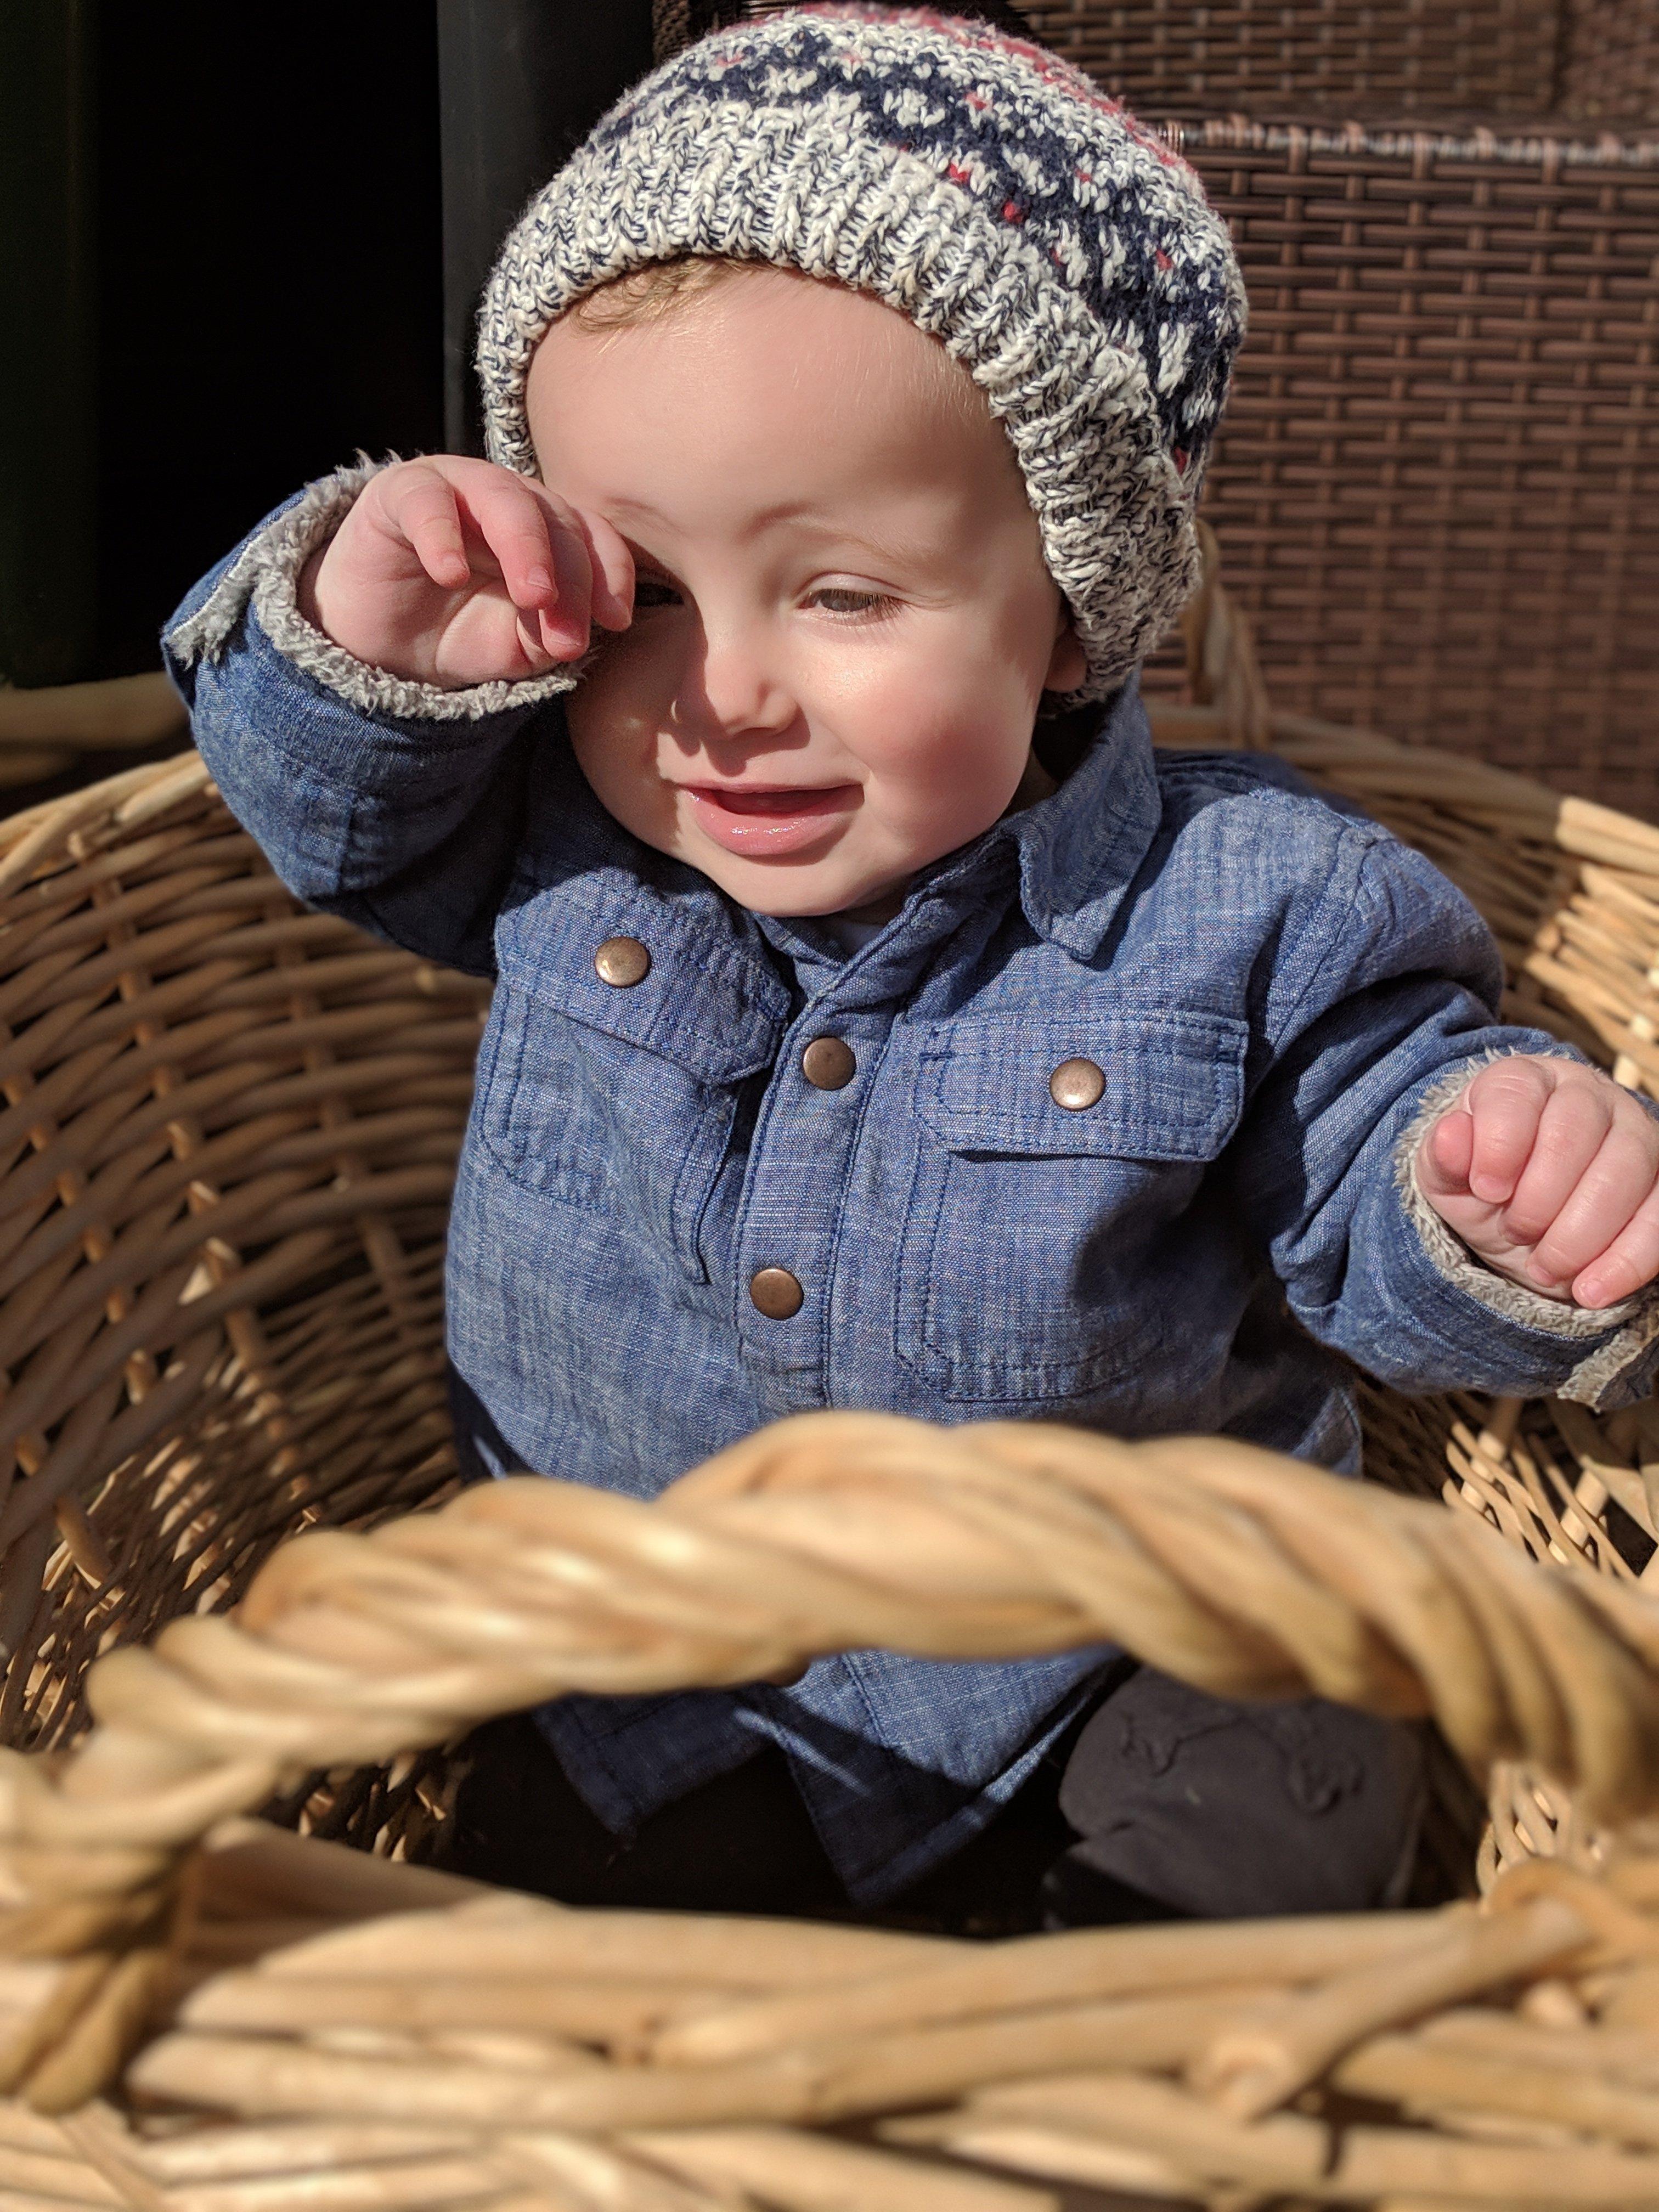 baby in a washing basket